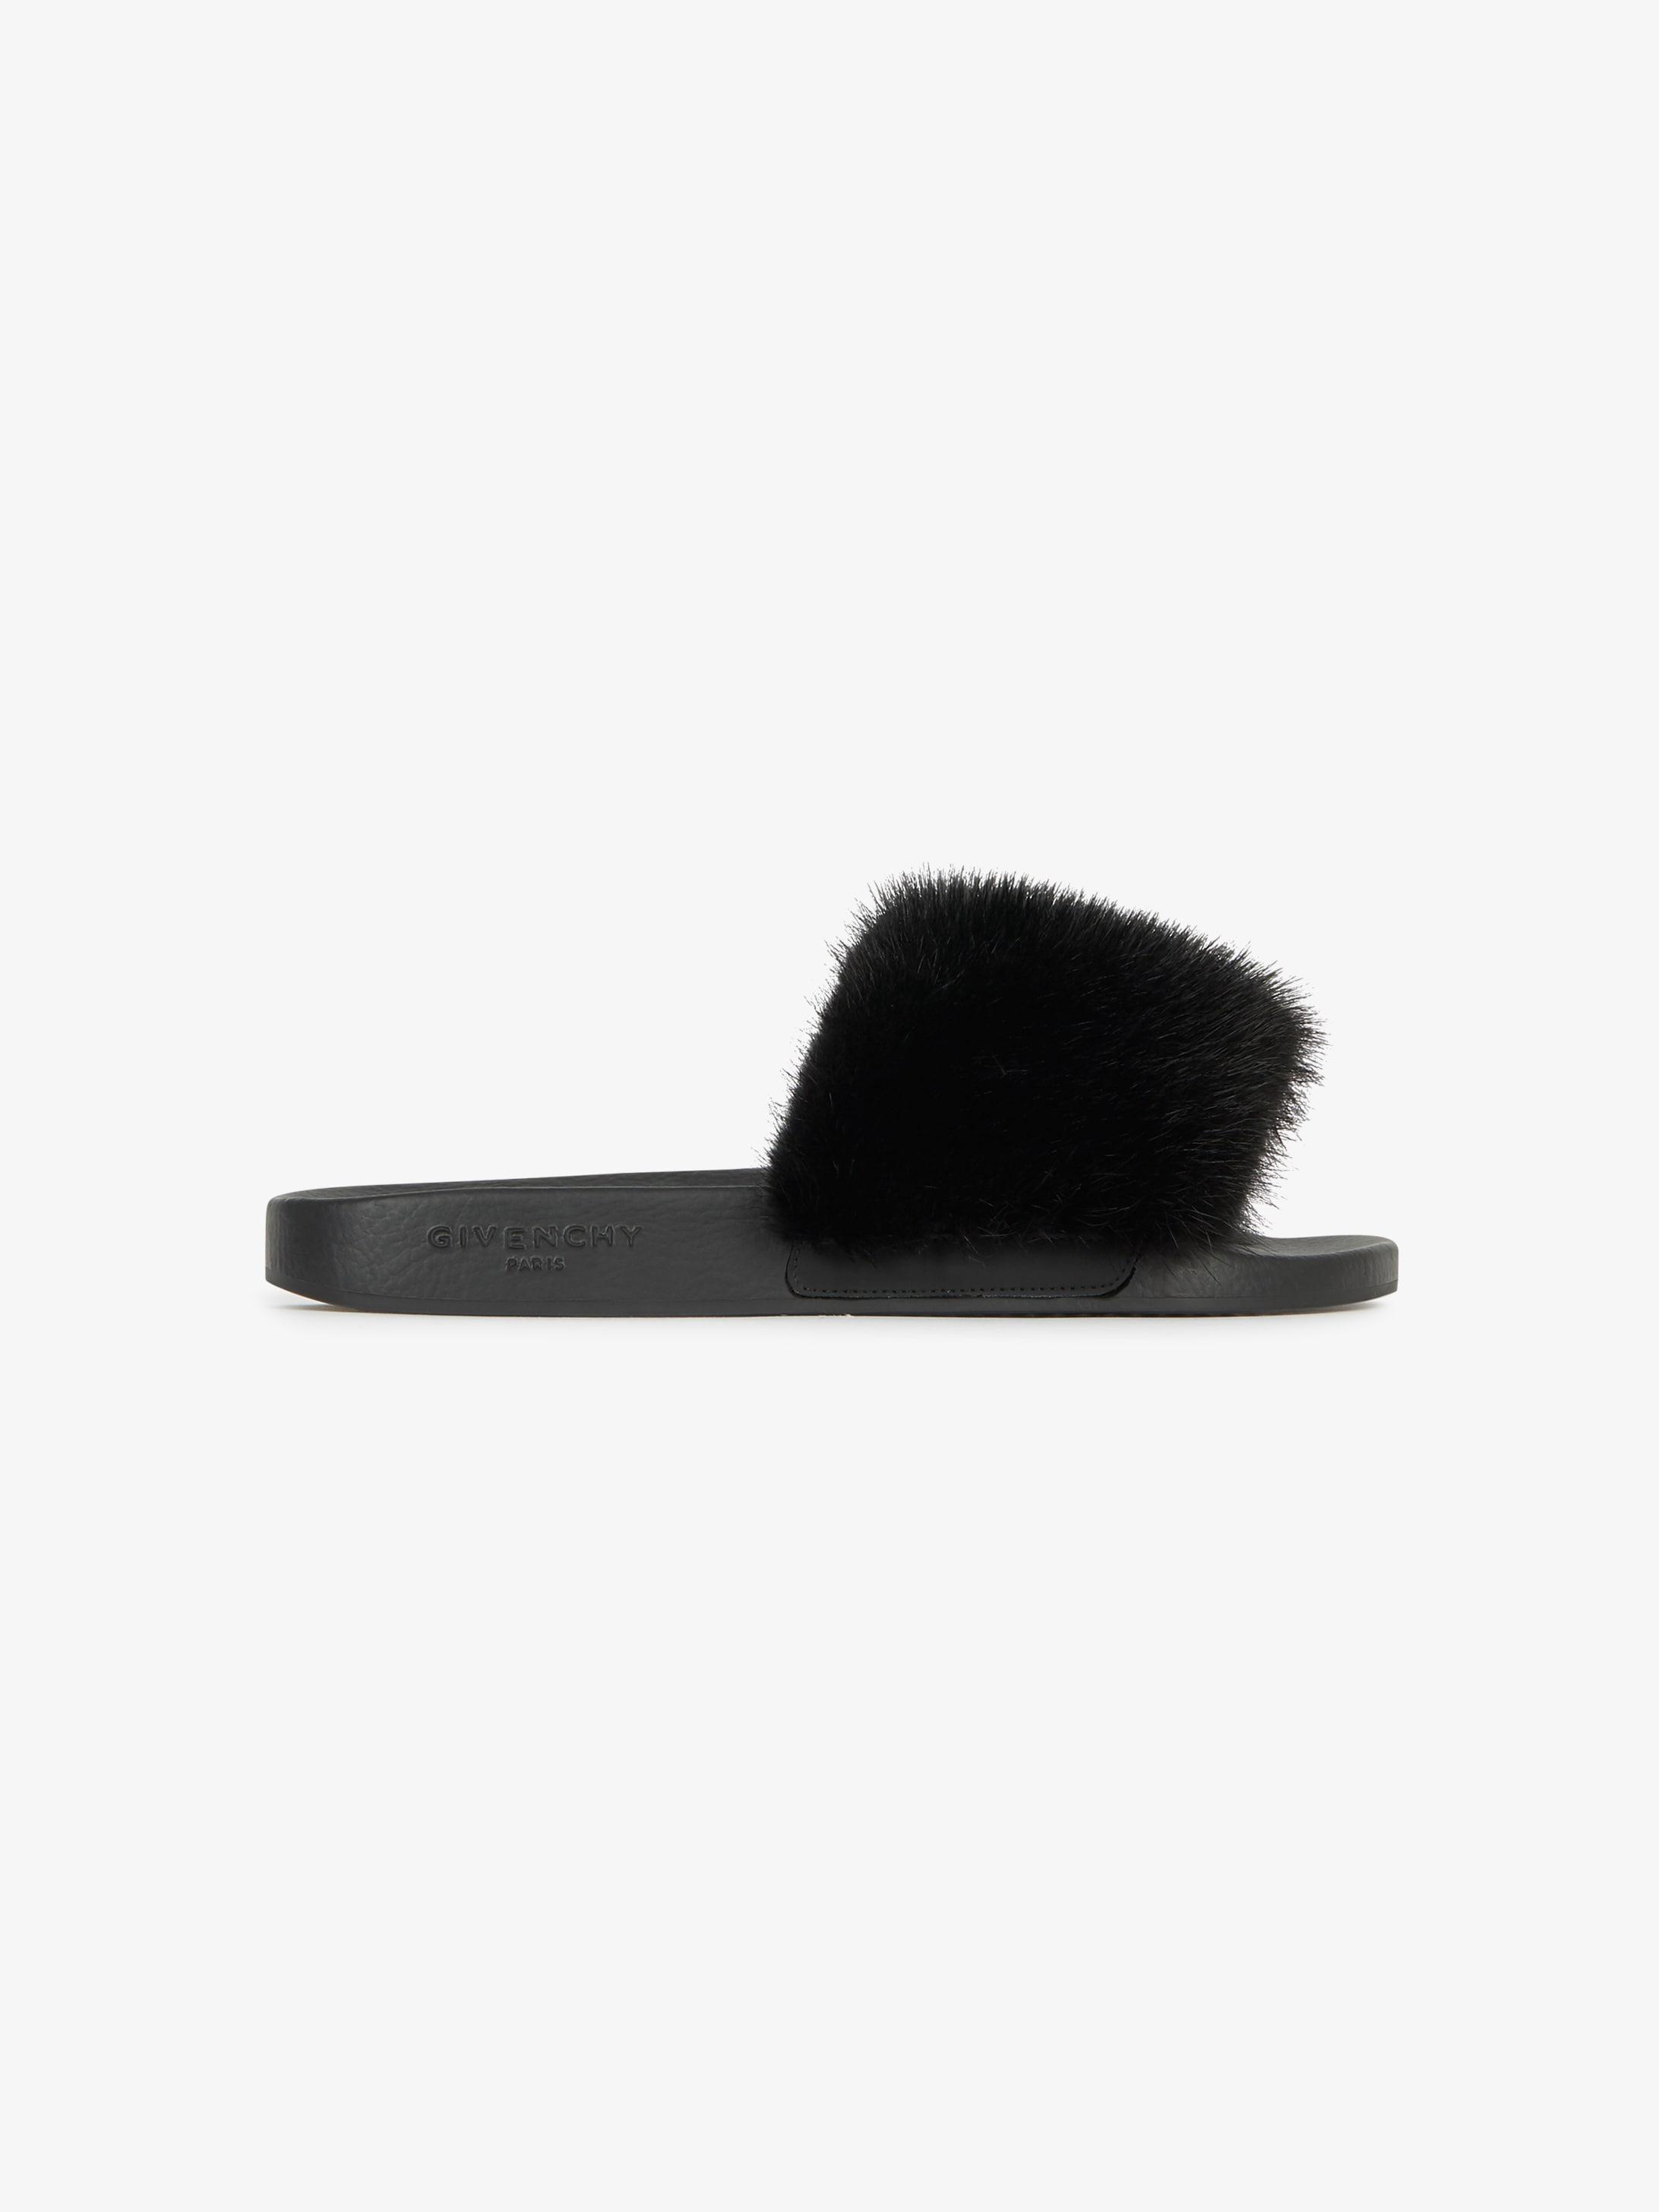 Sandales en gomme et vison